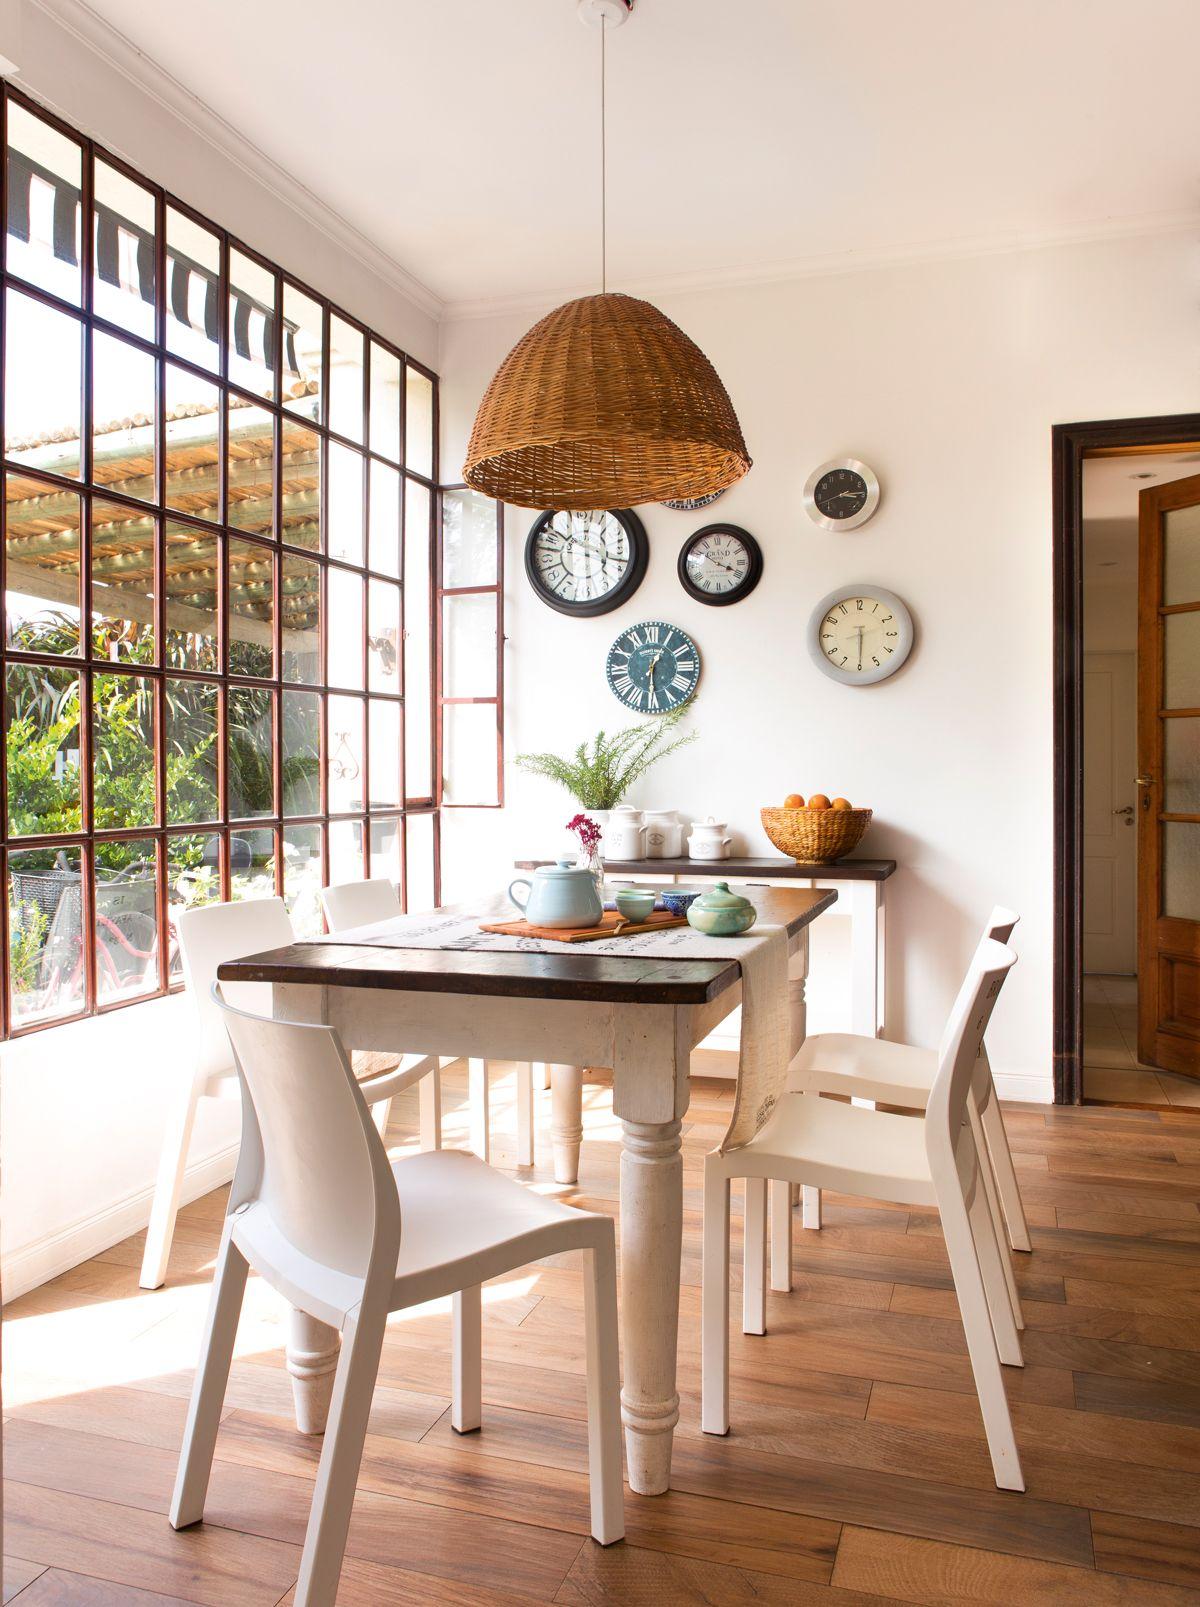 Muebles E Ideas Para Aprovechar Las Ventanas Life Quiet  # Muebles Fisherton